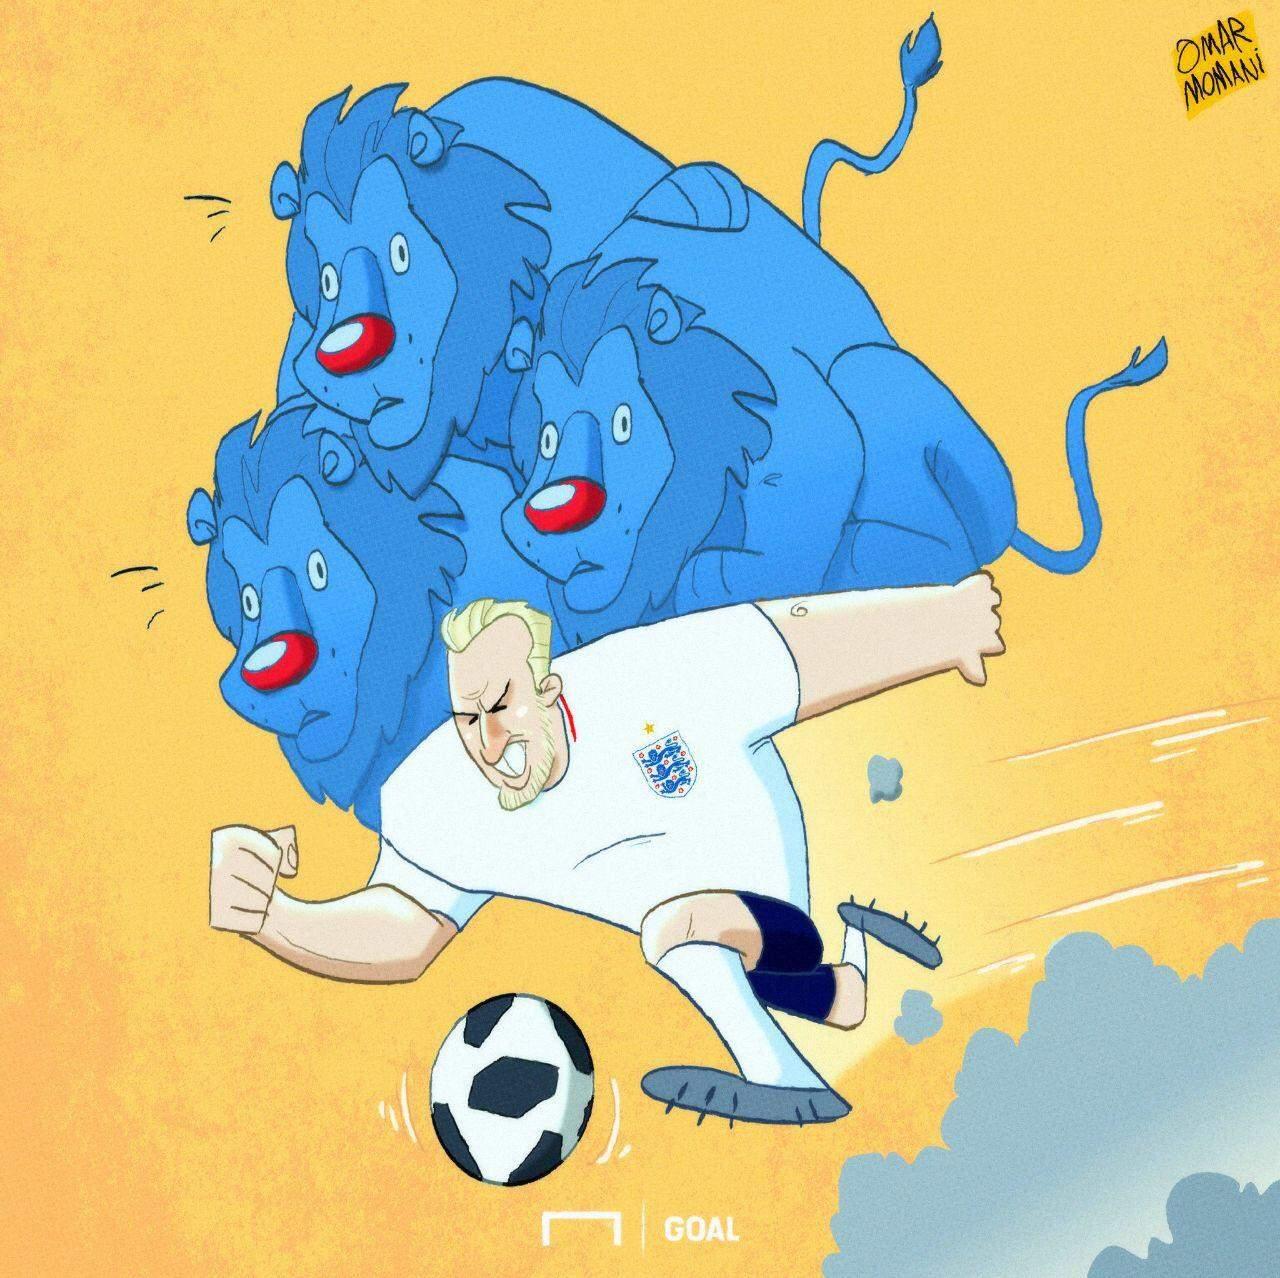 کاریکاتور گلزنی کین در بازی با تونس,کاریکاتور,عکس کاریکاتور,کاریکاتور ورزشی